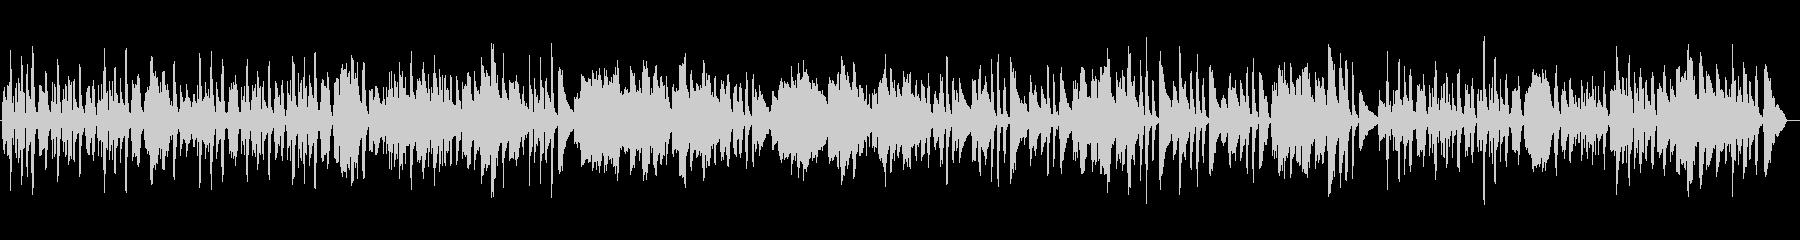 "Gossec ""Gavot"" flute live performance's unreproduced waveform"